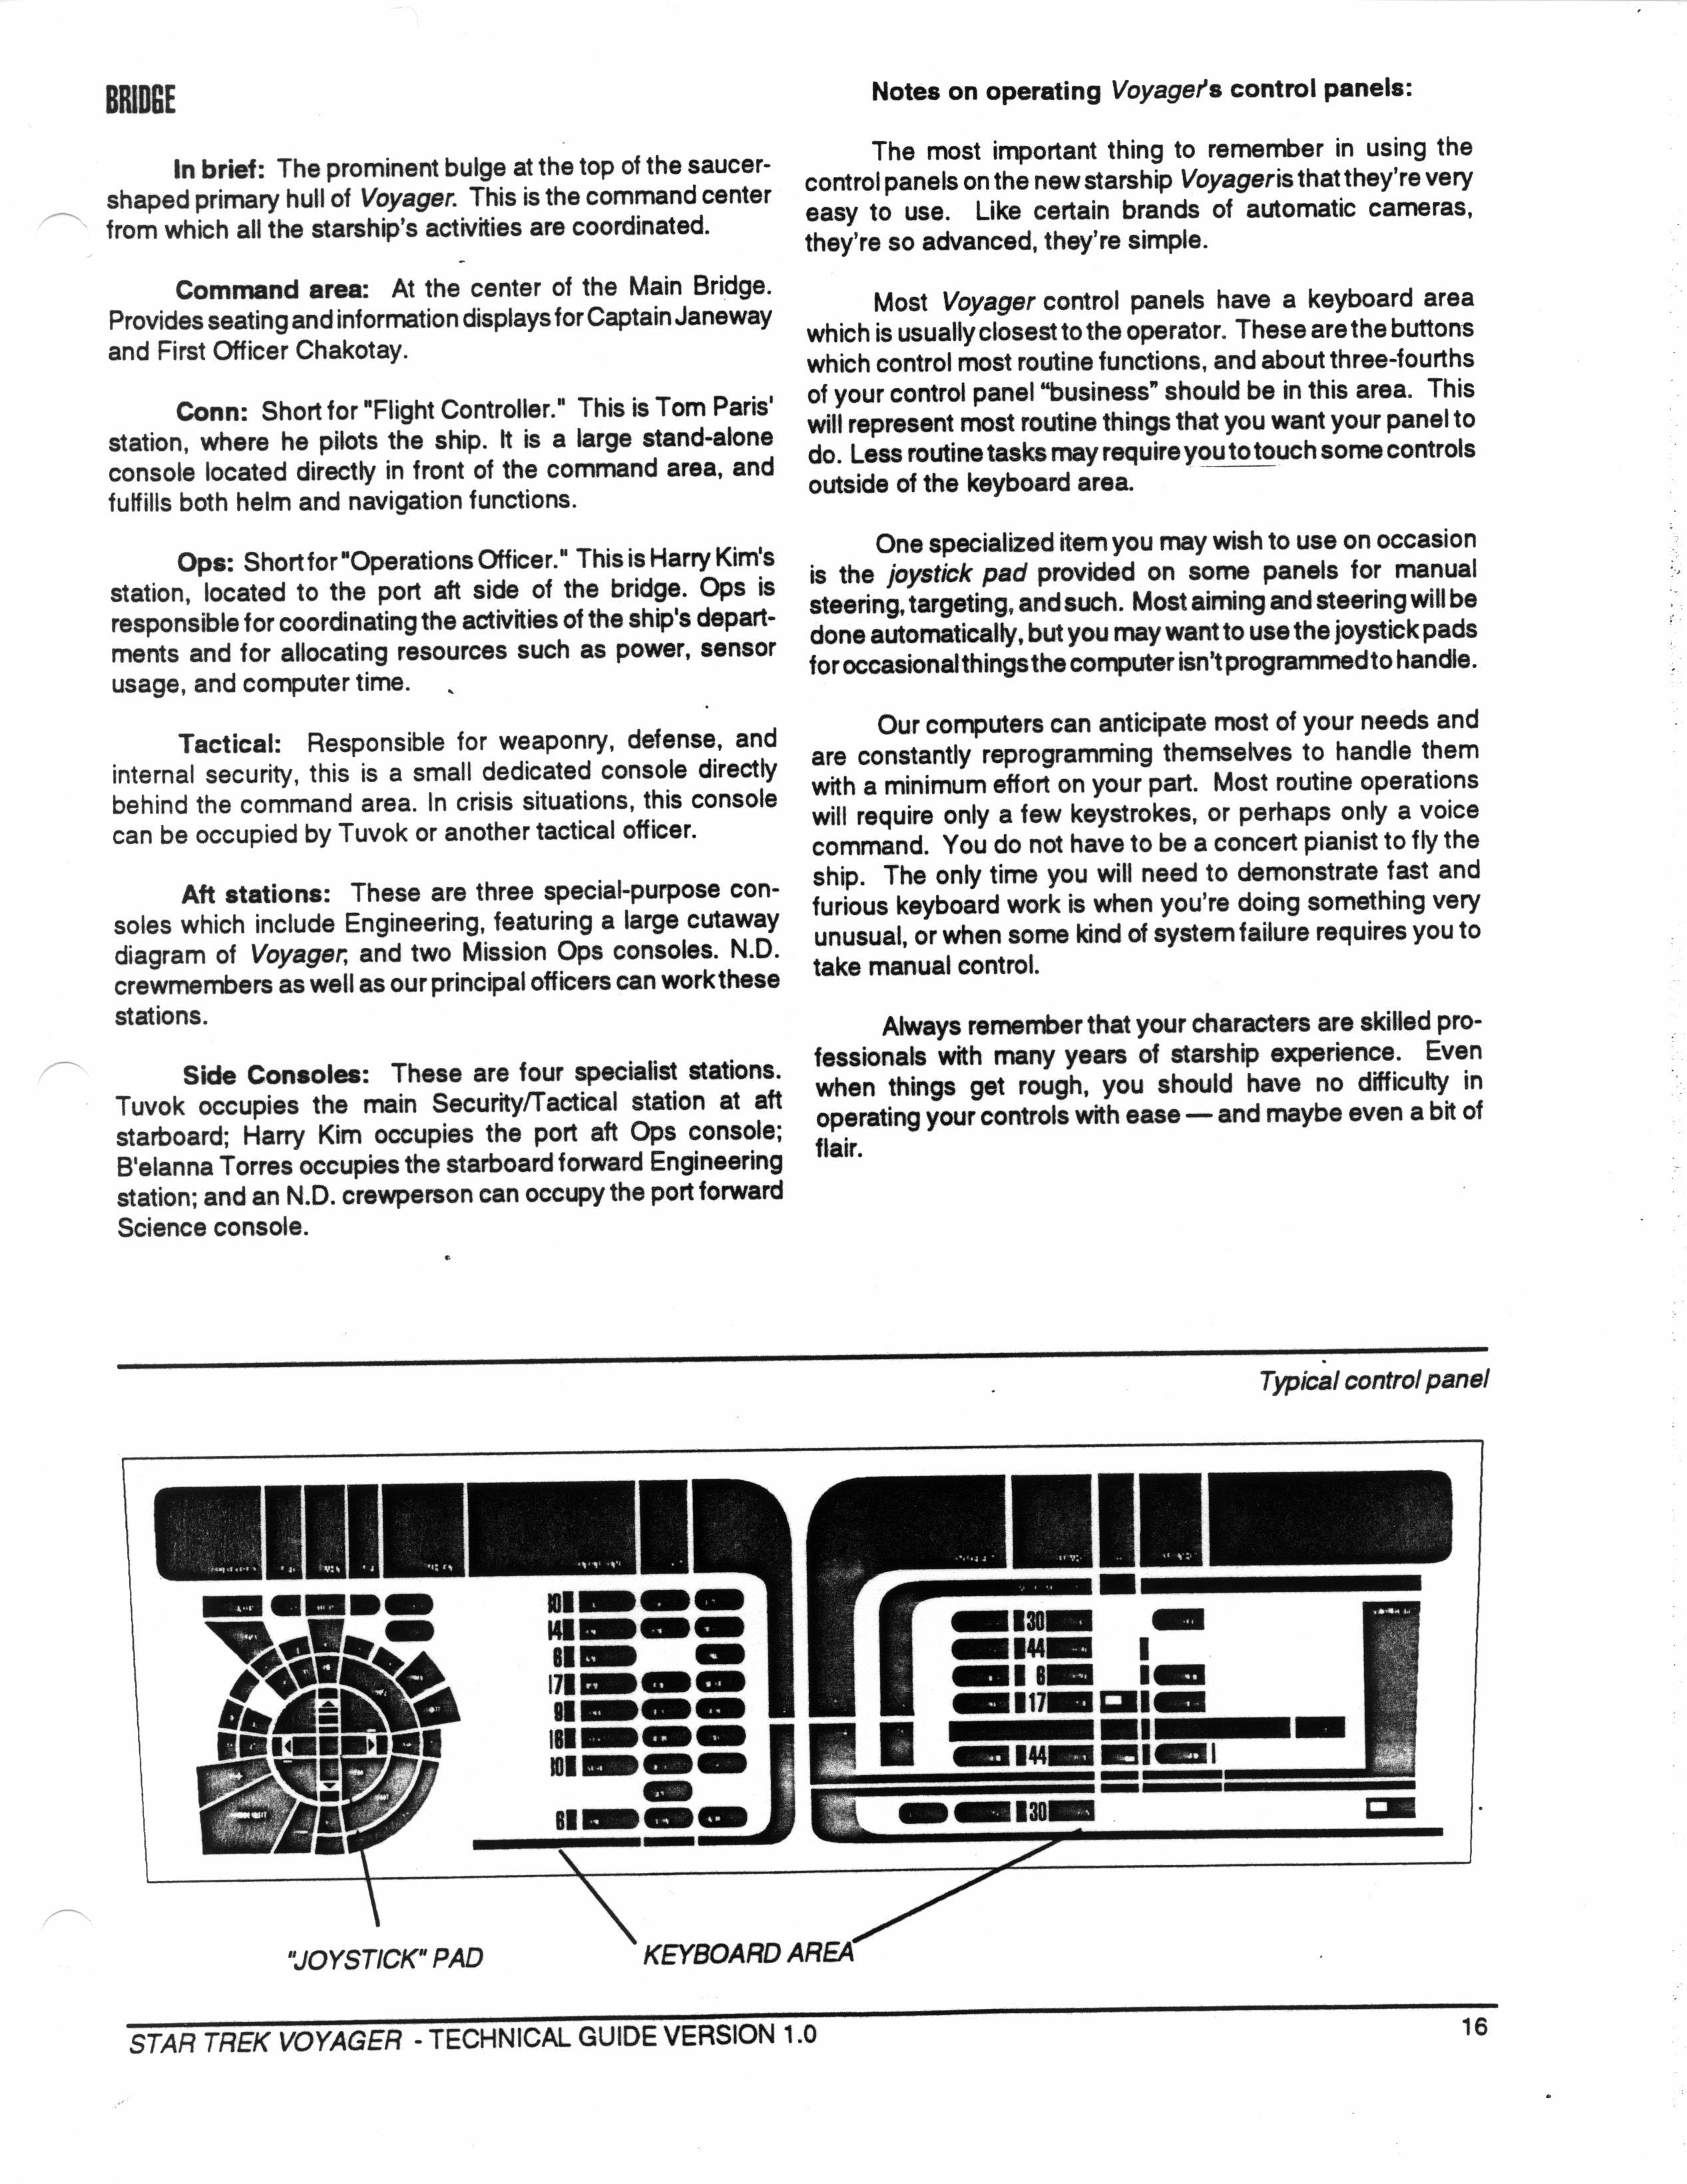 Star Trek Blueprints Voyager Technical Manual Schematics